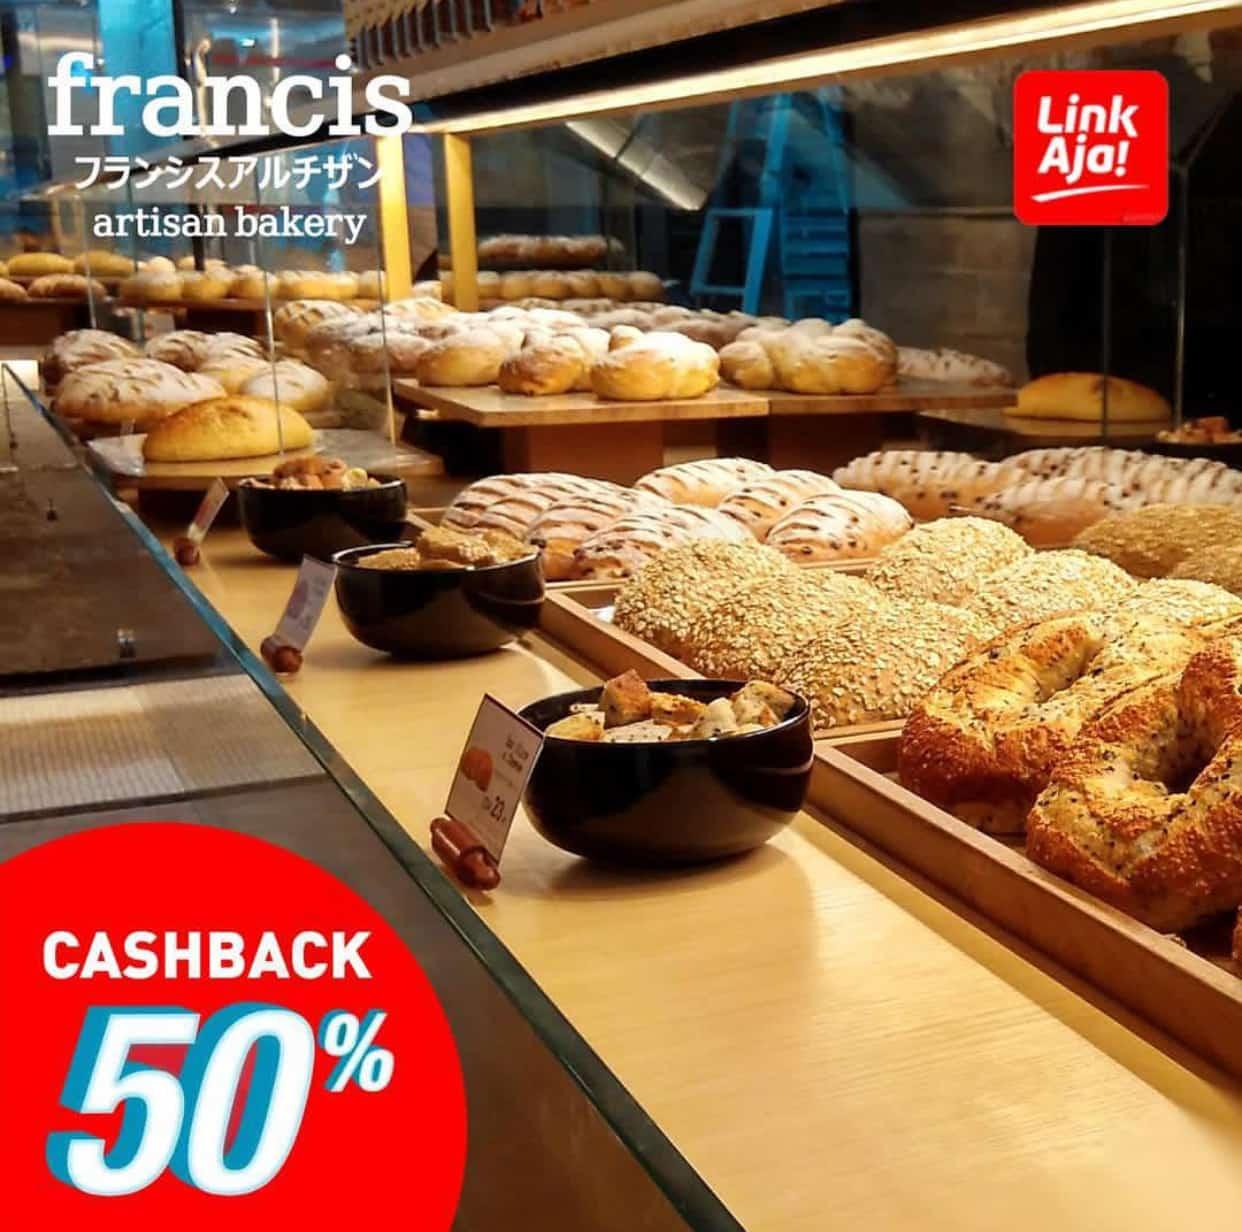 Francis Artisan Bakery Promo CASHBACK 50% untuk transaksi LinkAja